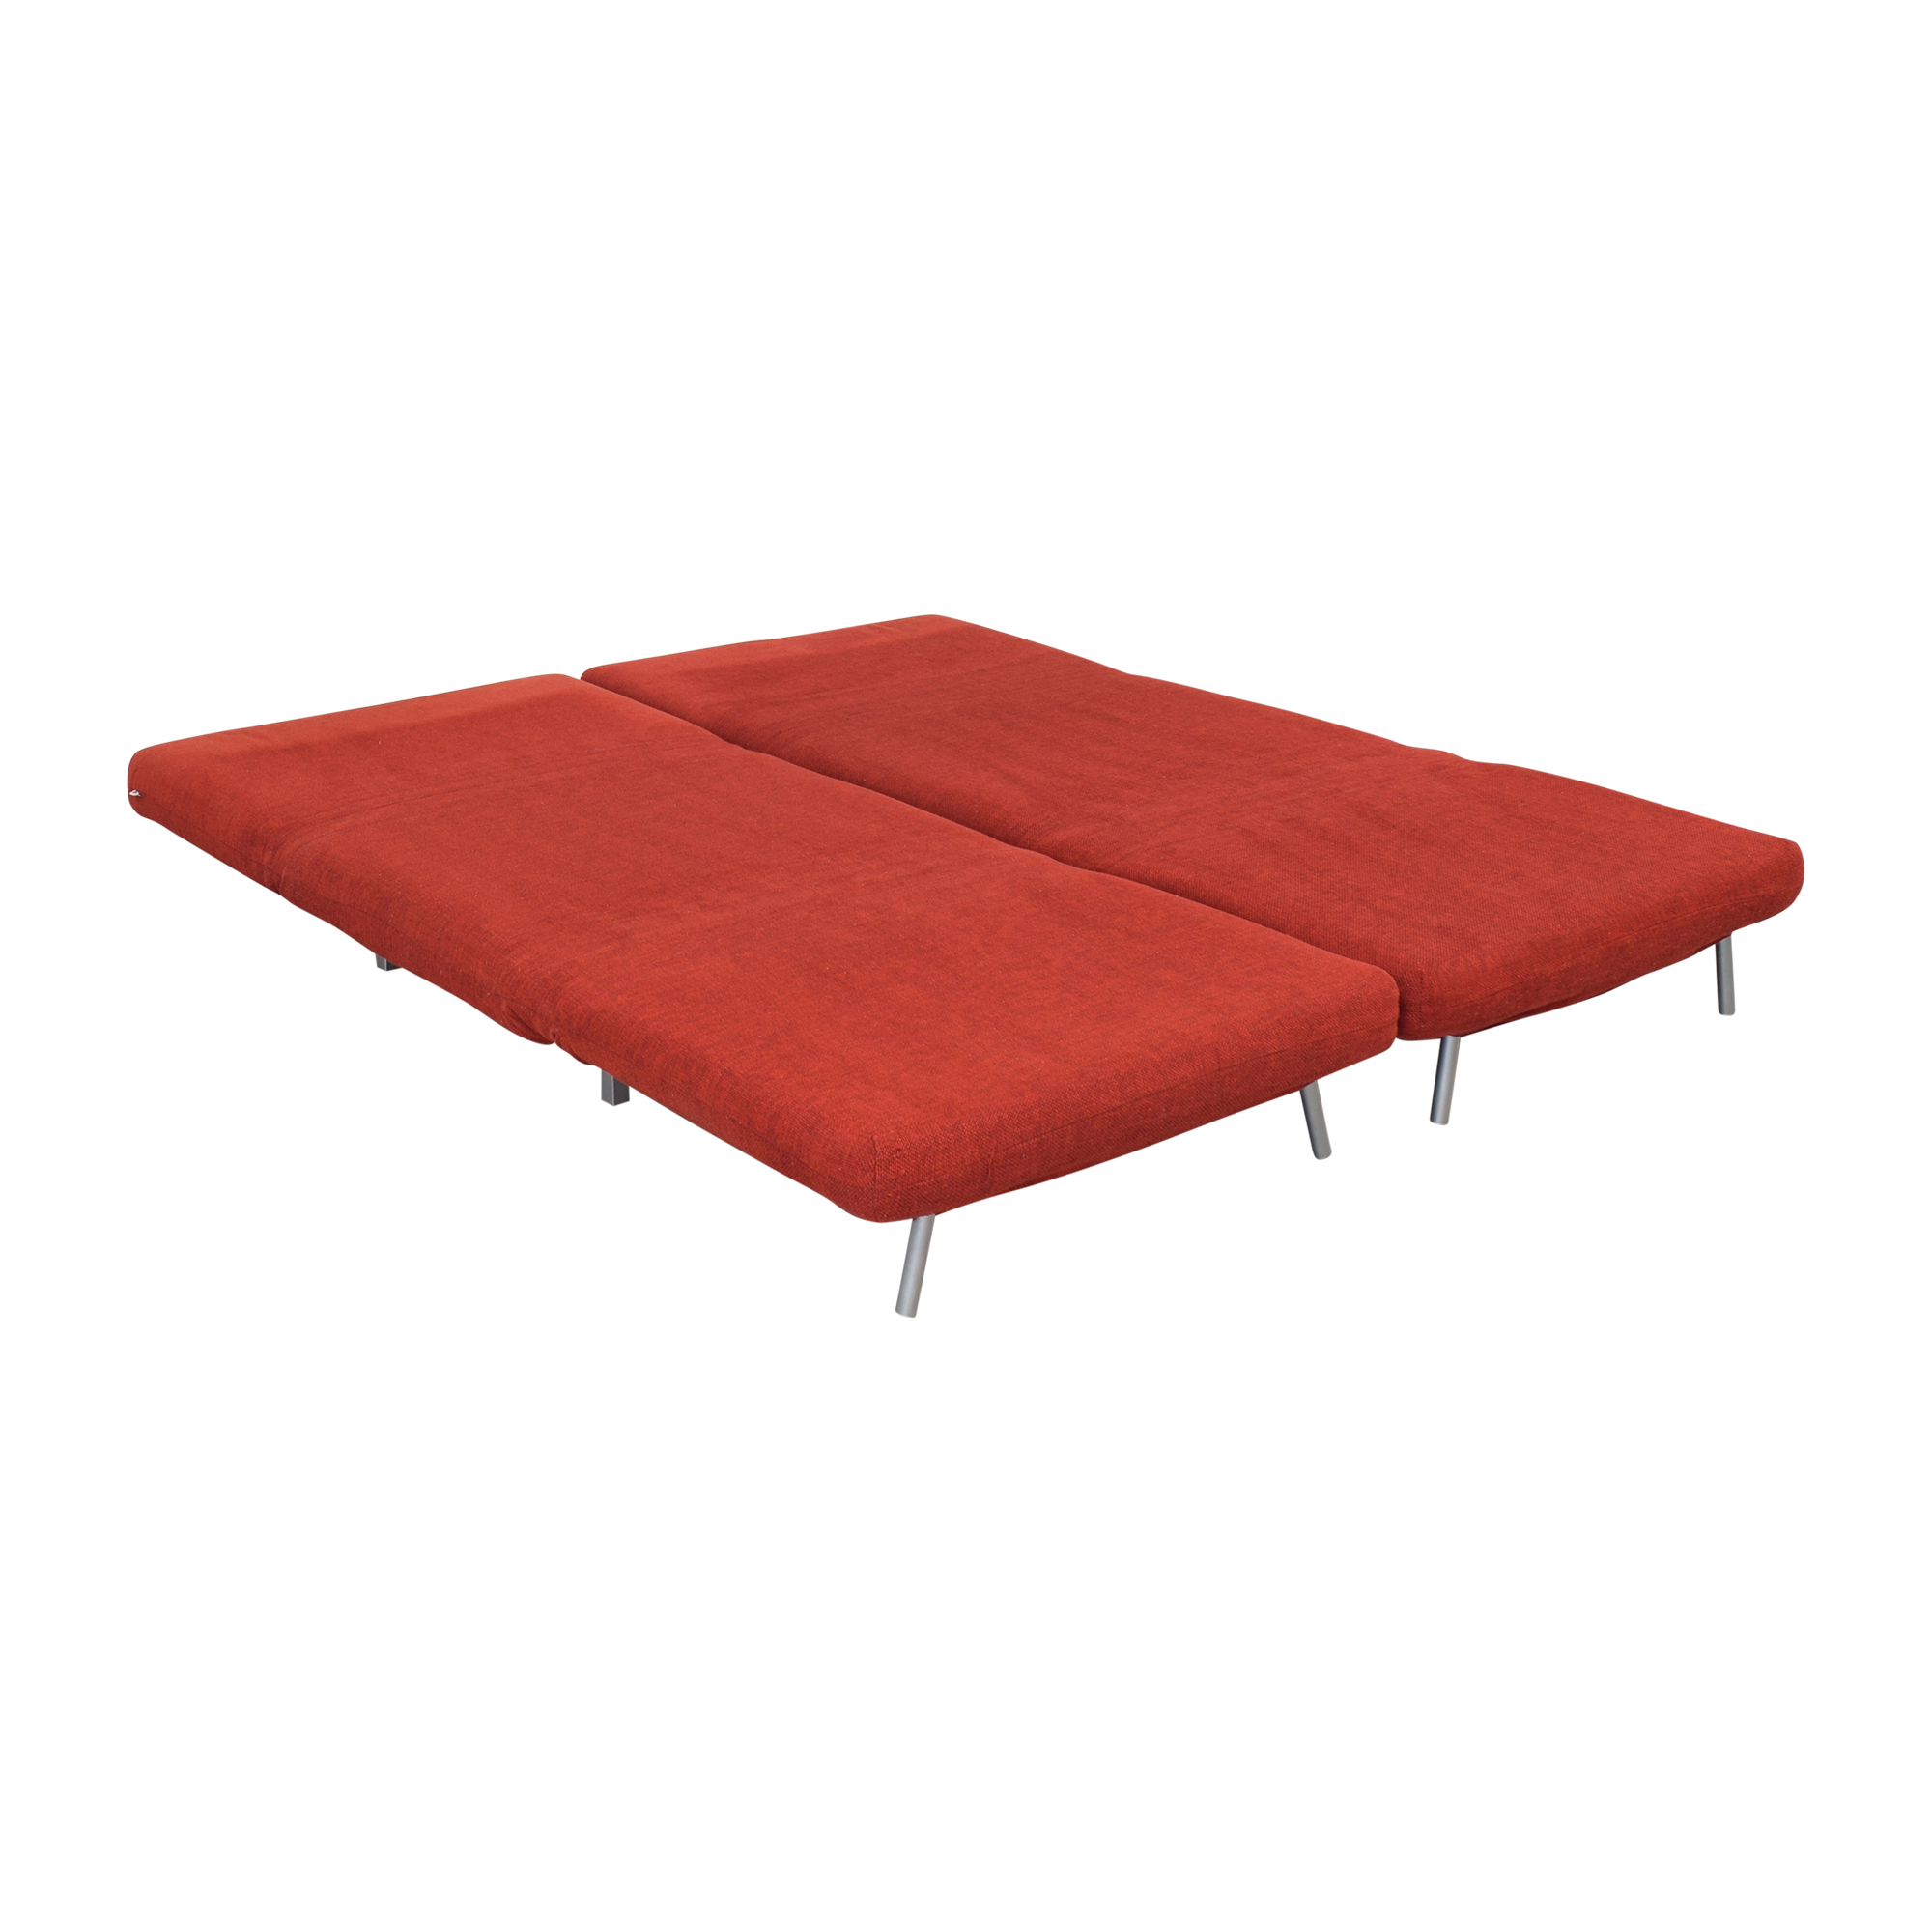 IDO IDO Swivel Convertible Sofa Bed nyc